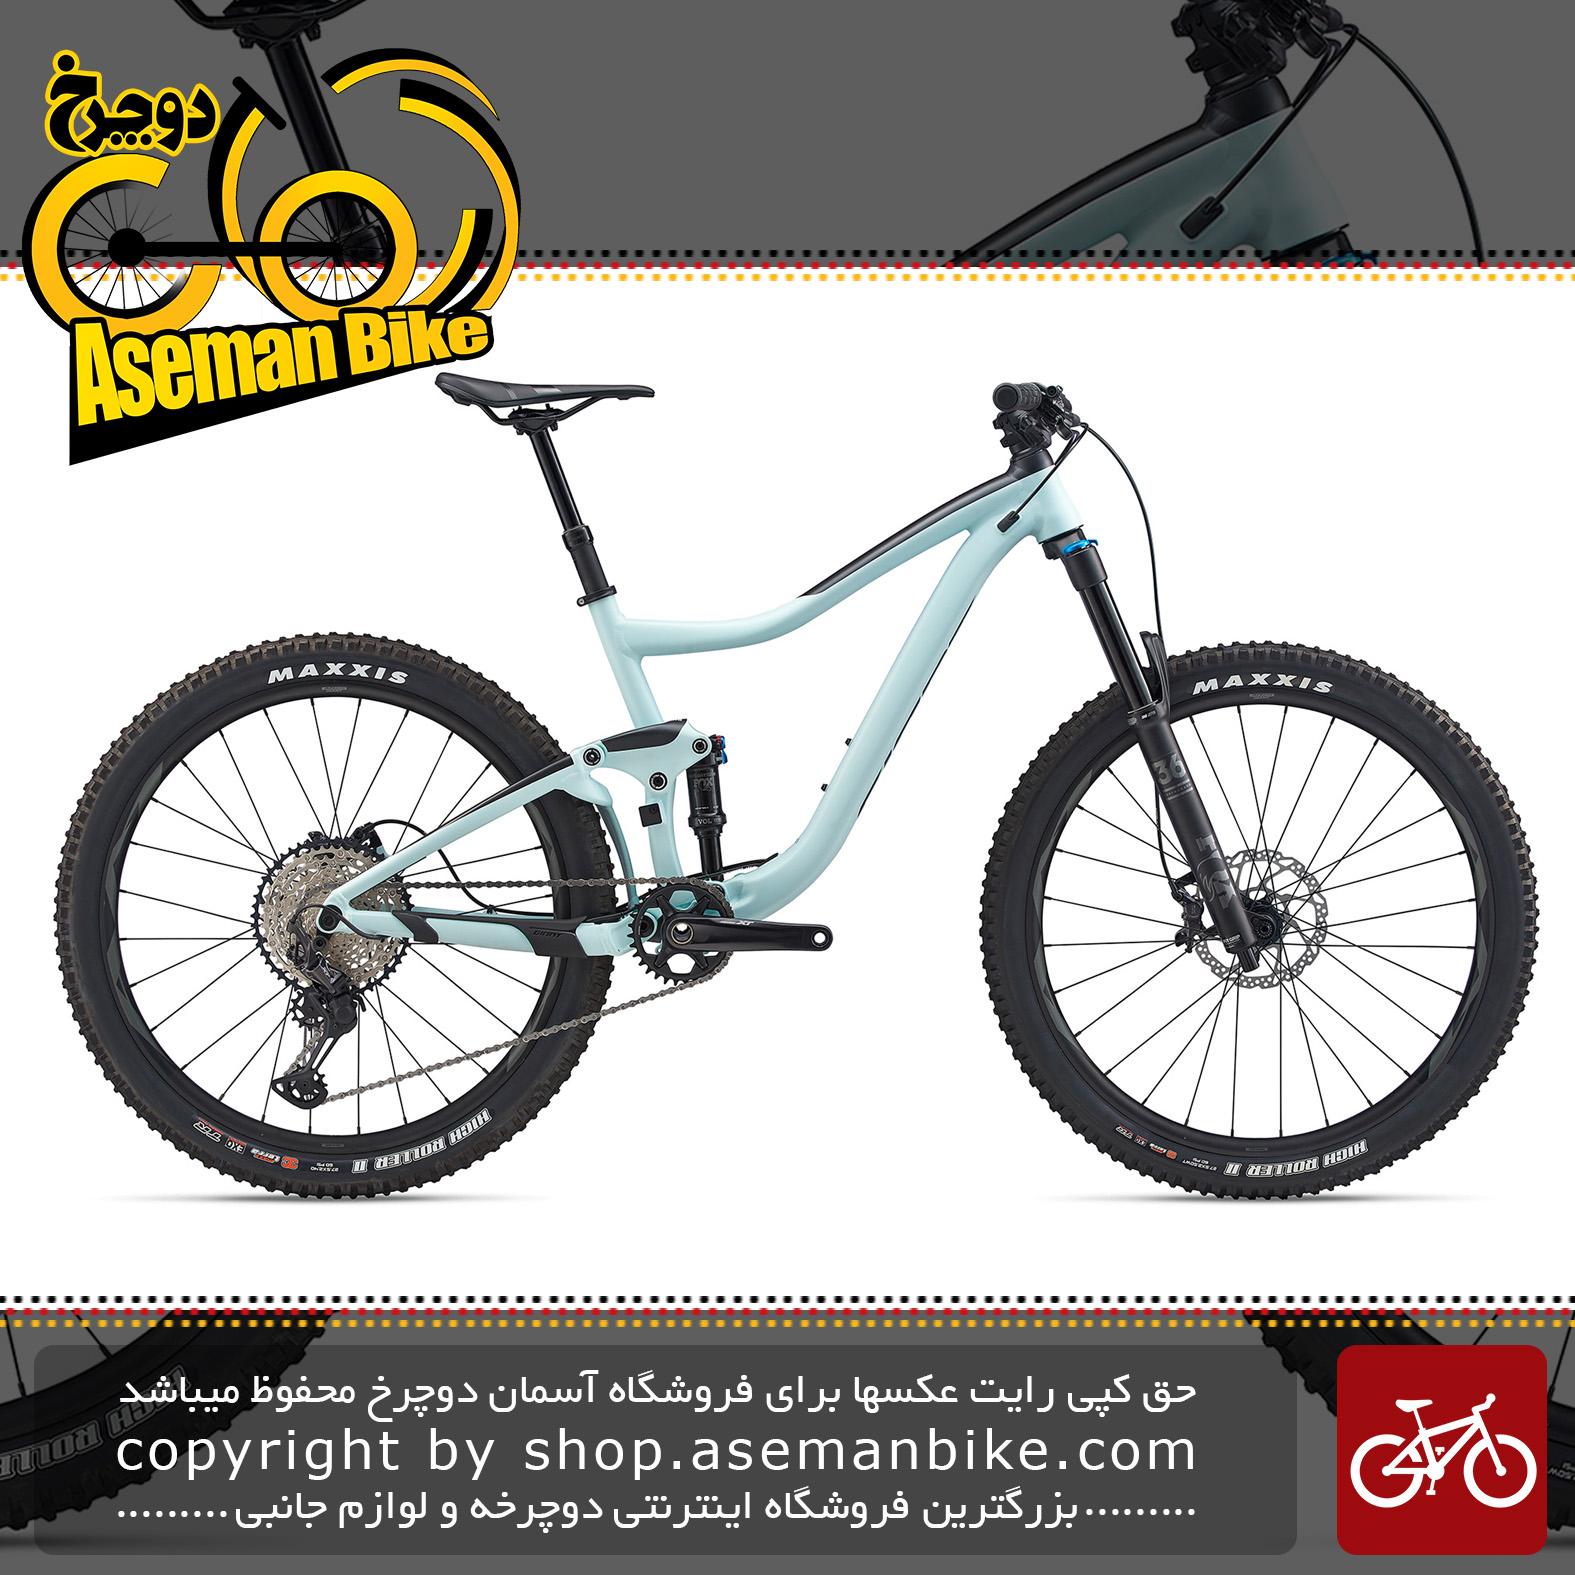 دوچرخه کوهستان جاینت مدل ترنس 1 2020 Giant Mountain Bicycle Trance 1 2020